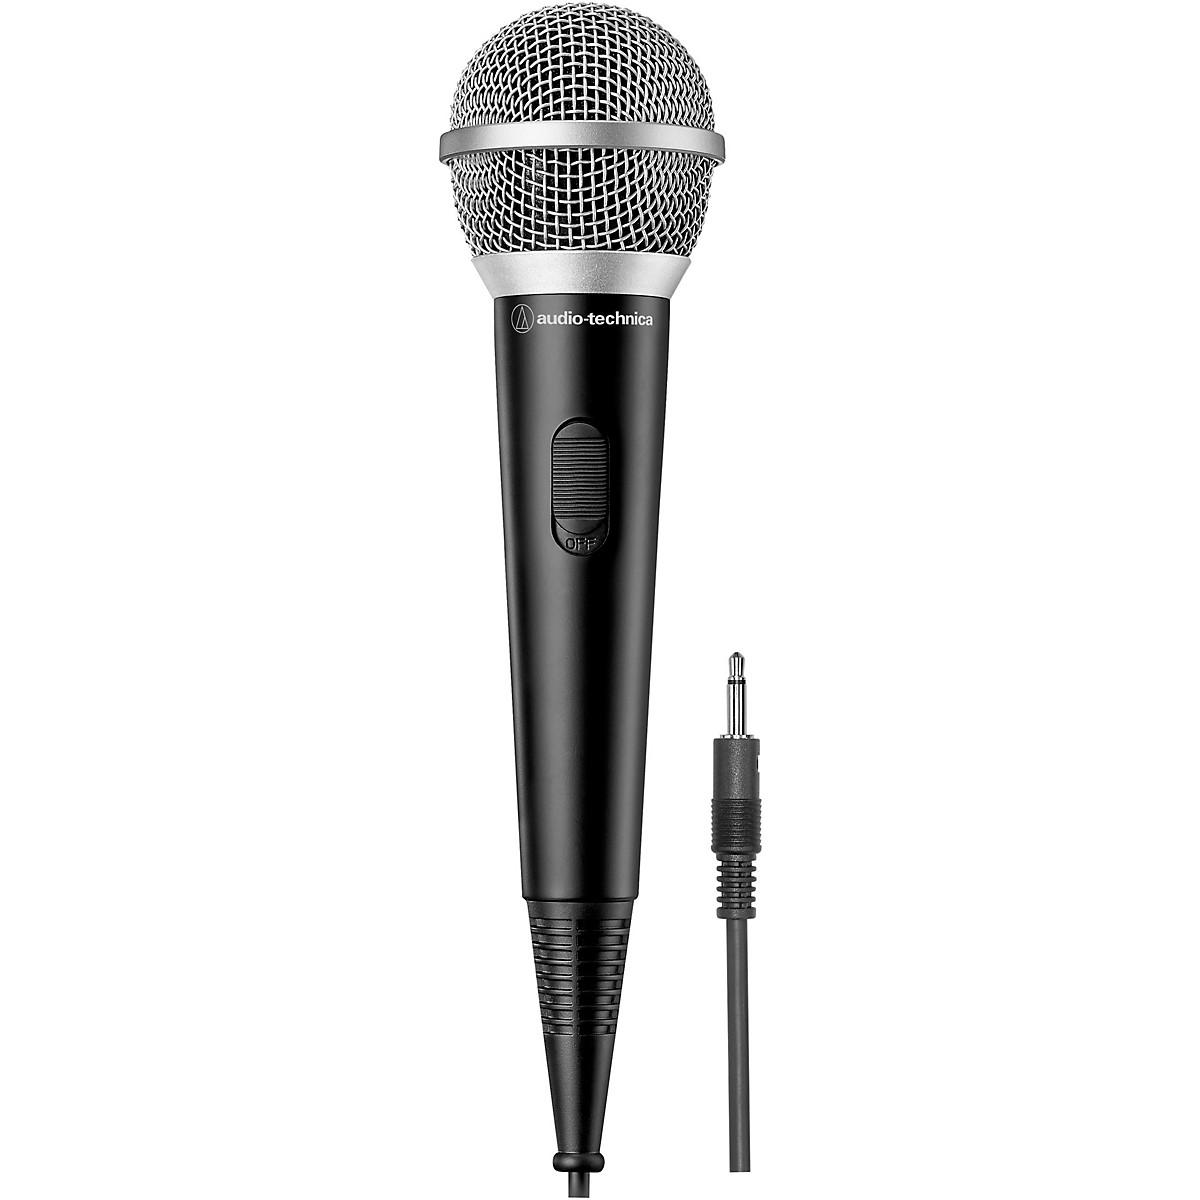 Audio-Technica ATR1200X Unidirectional Dynamic Vocal/Instrument Microphone